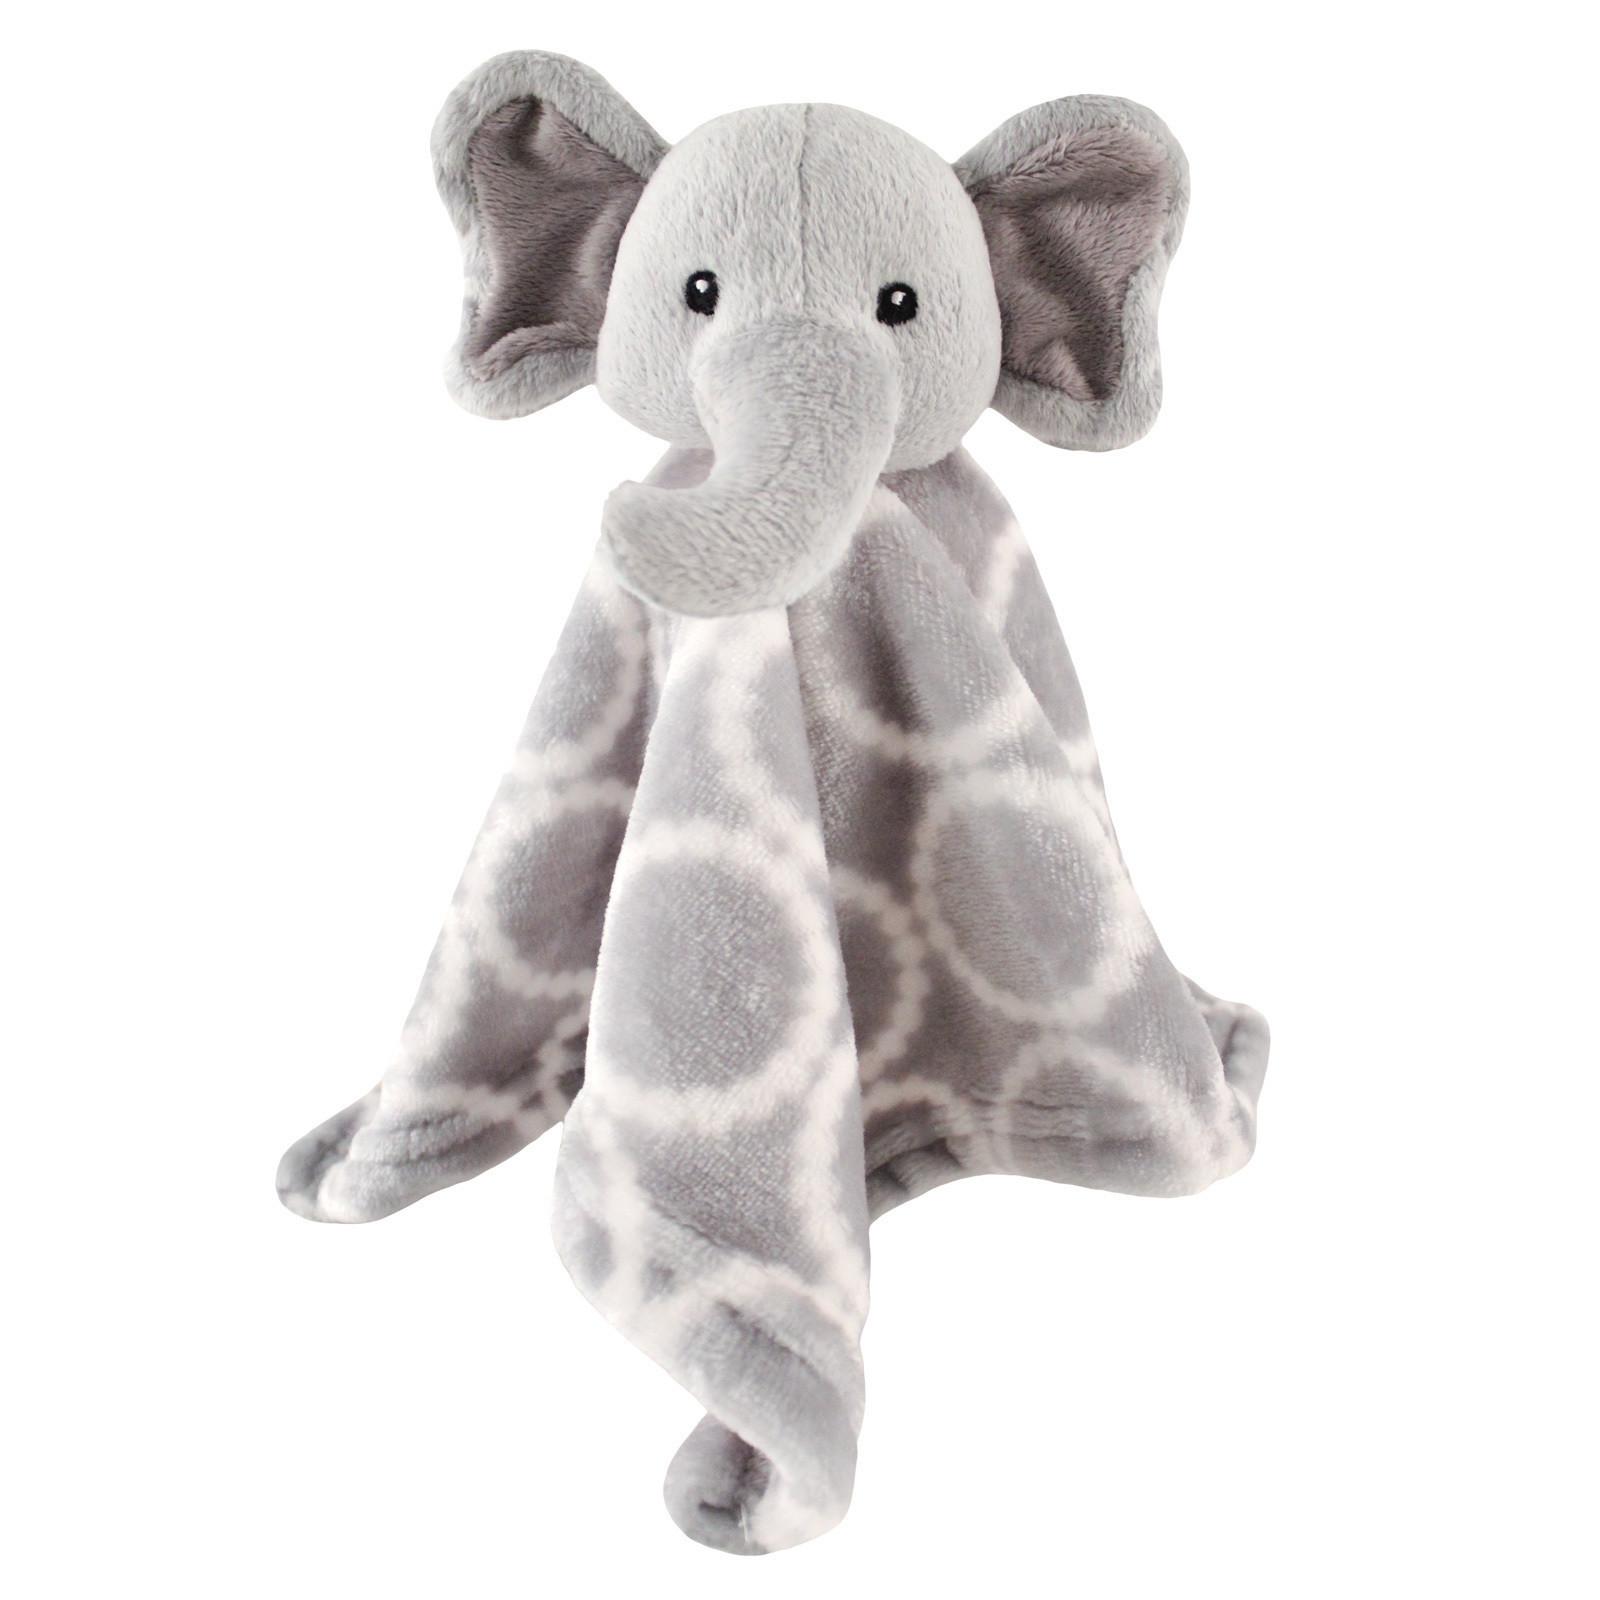 10250589elephant